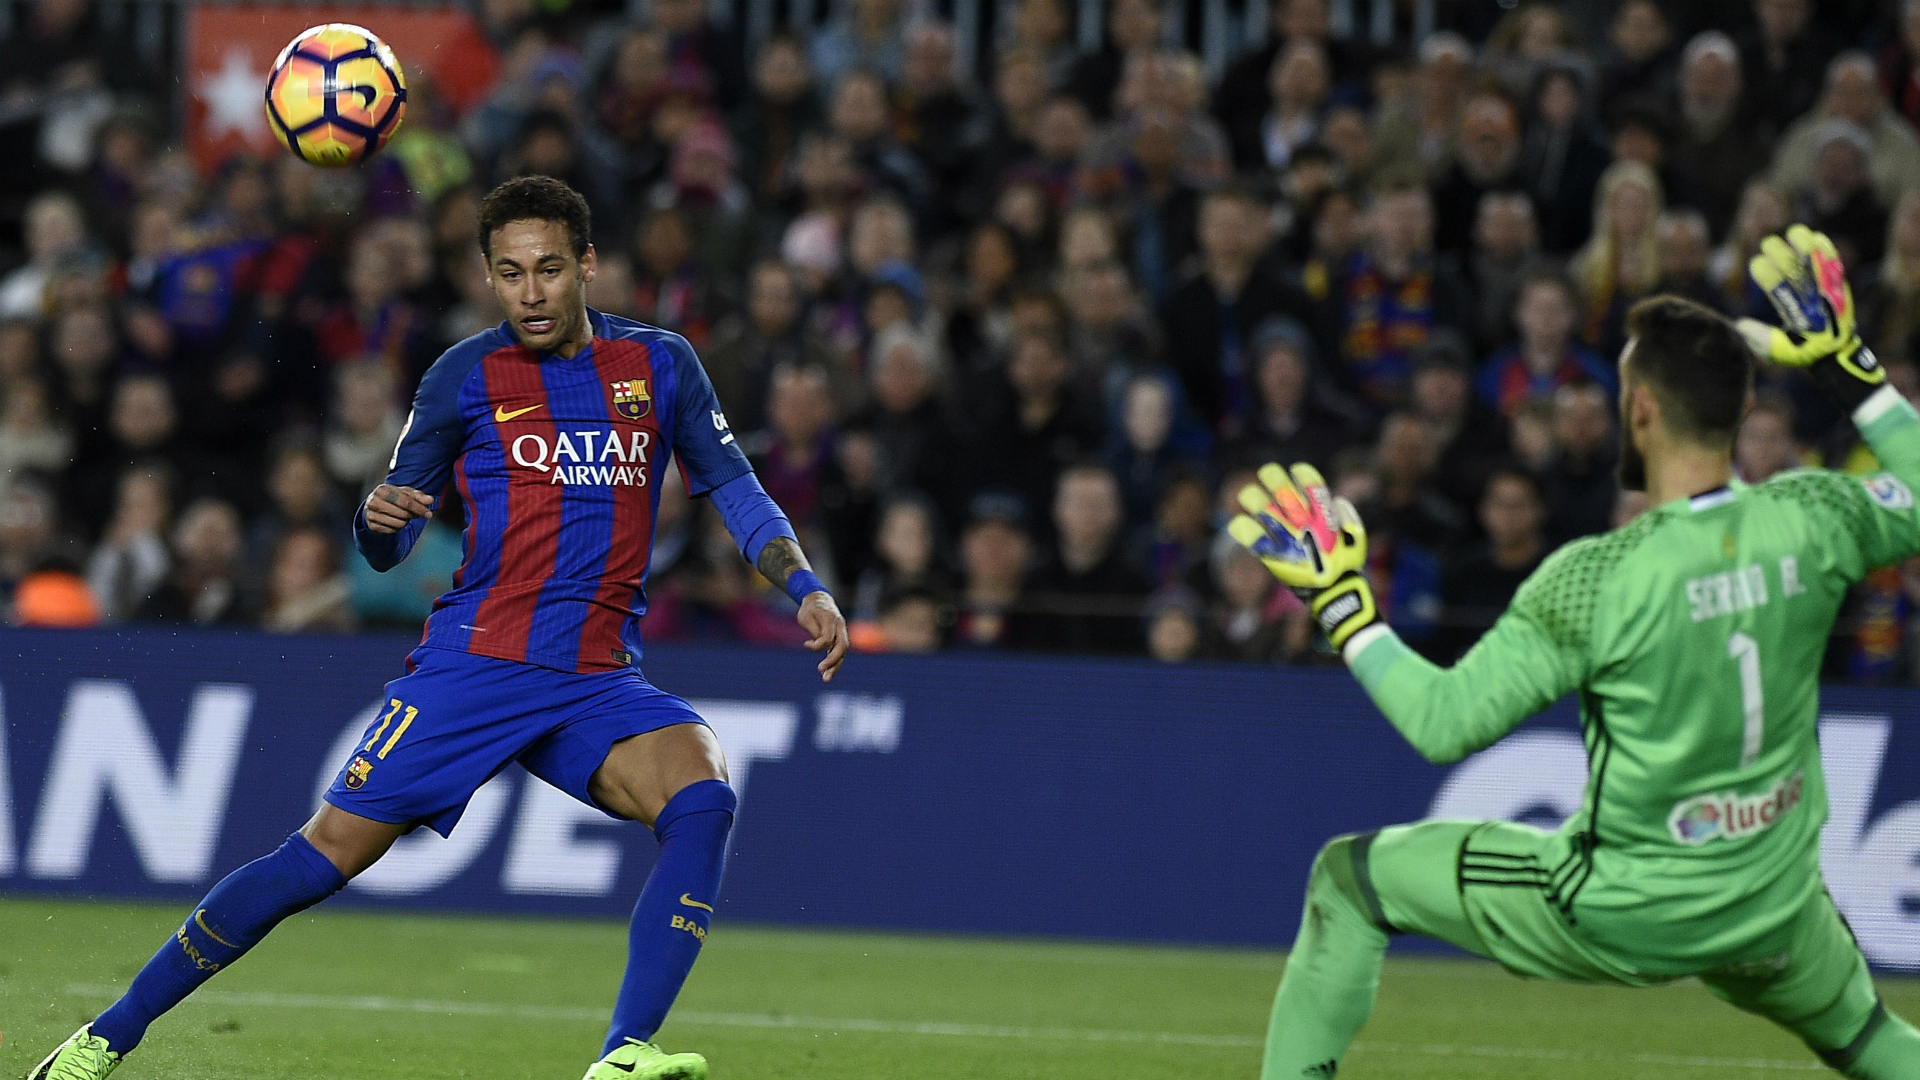 PREVIEW: Barcelona – Celta de Vigo 11.01.2018